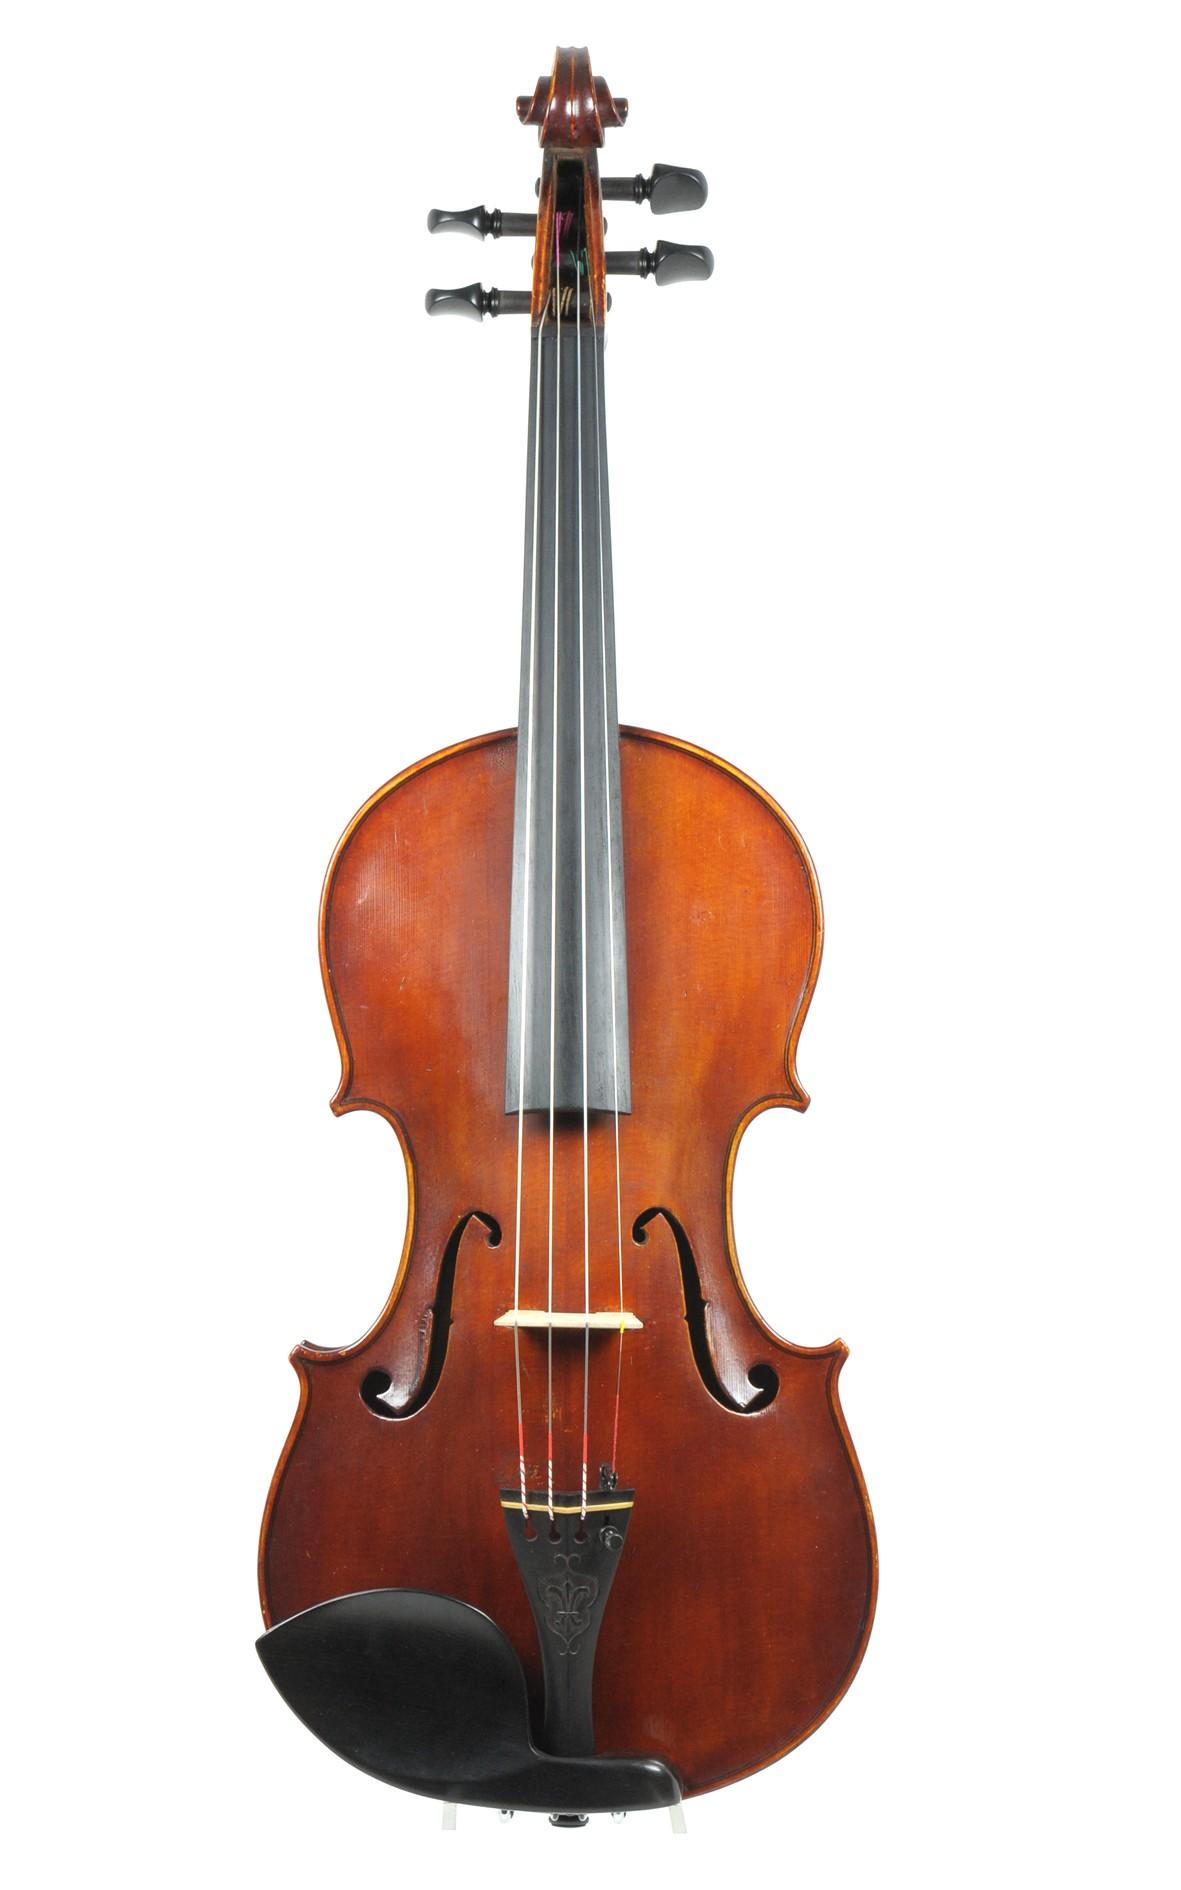 Frank Watson, Rochdale, English violin, No. 38, 1900 - table